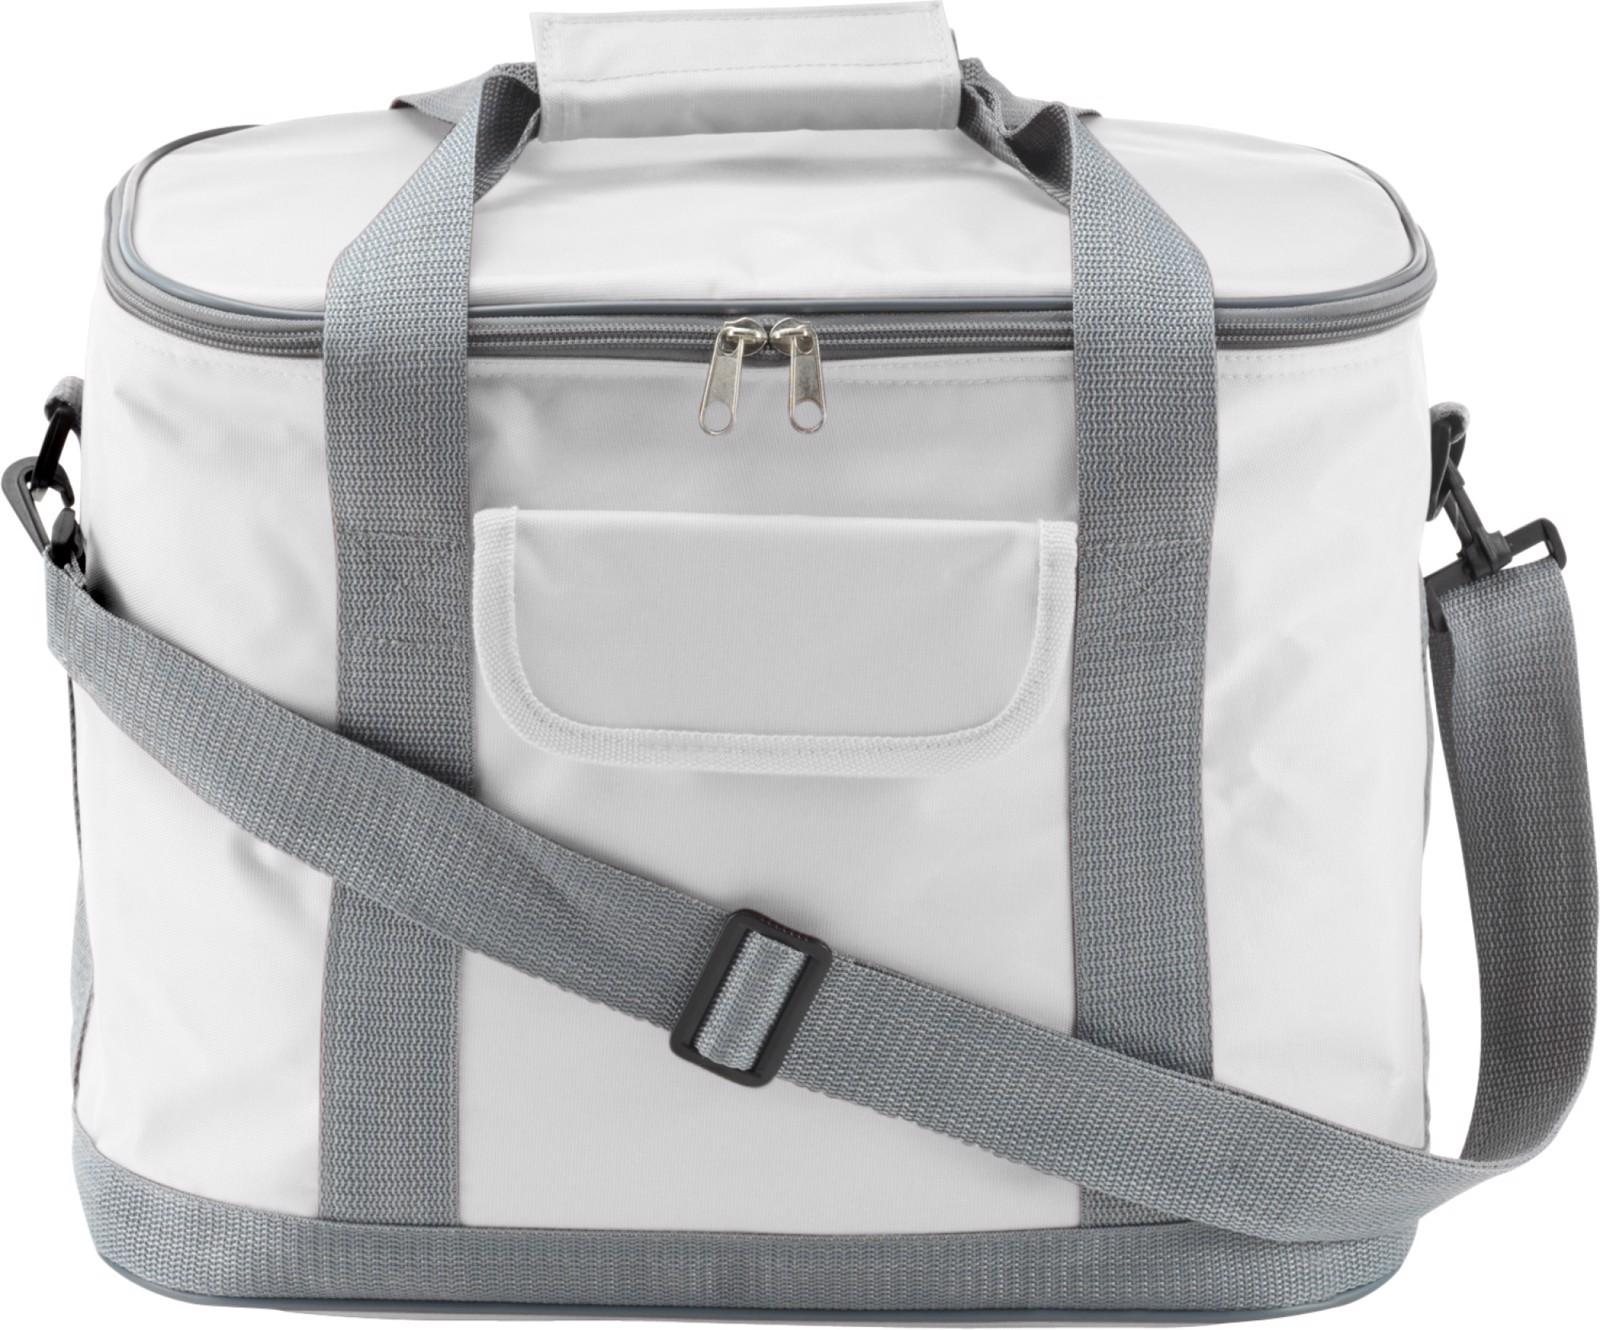 Polyester (420D) cooler bag - White